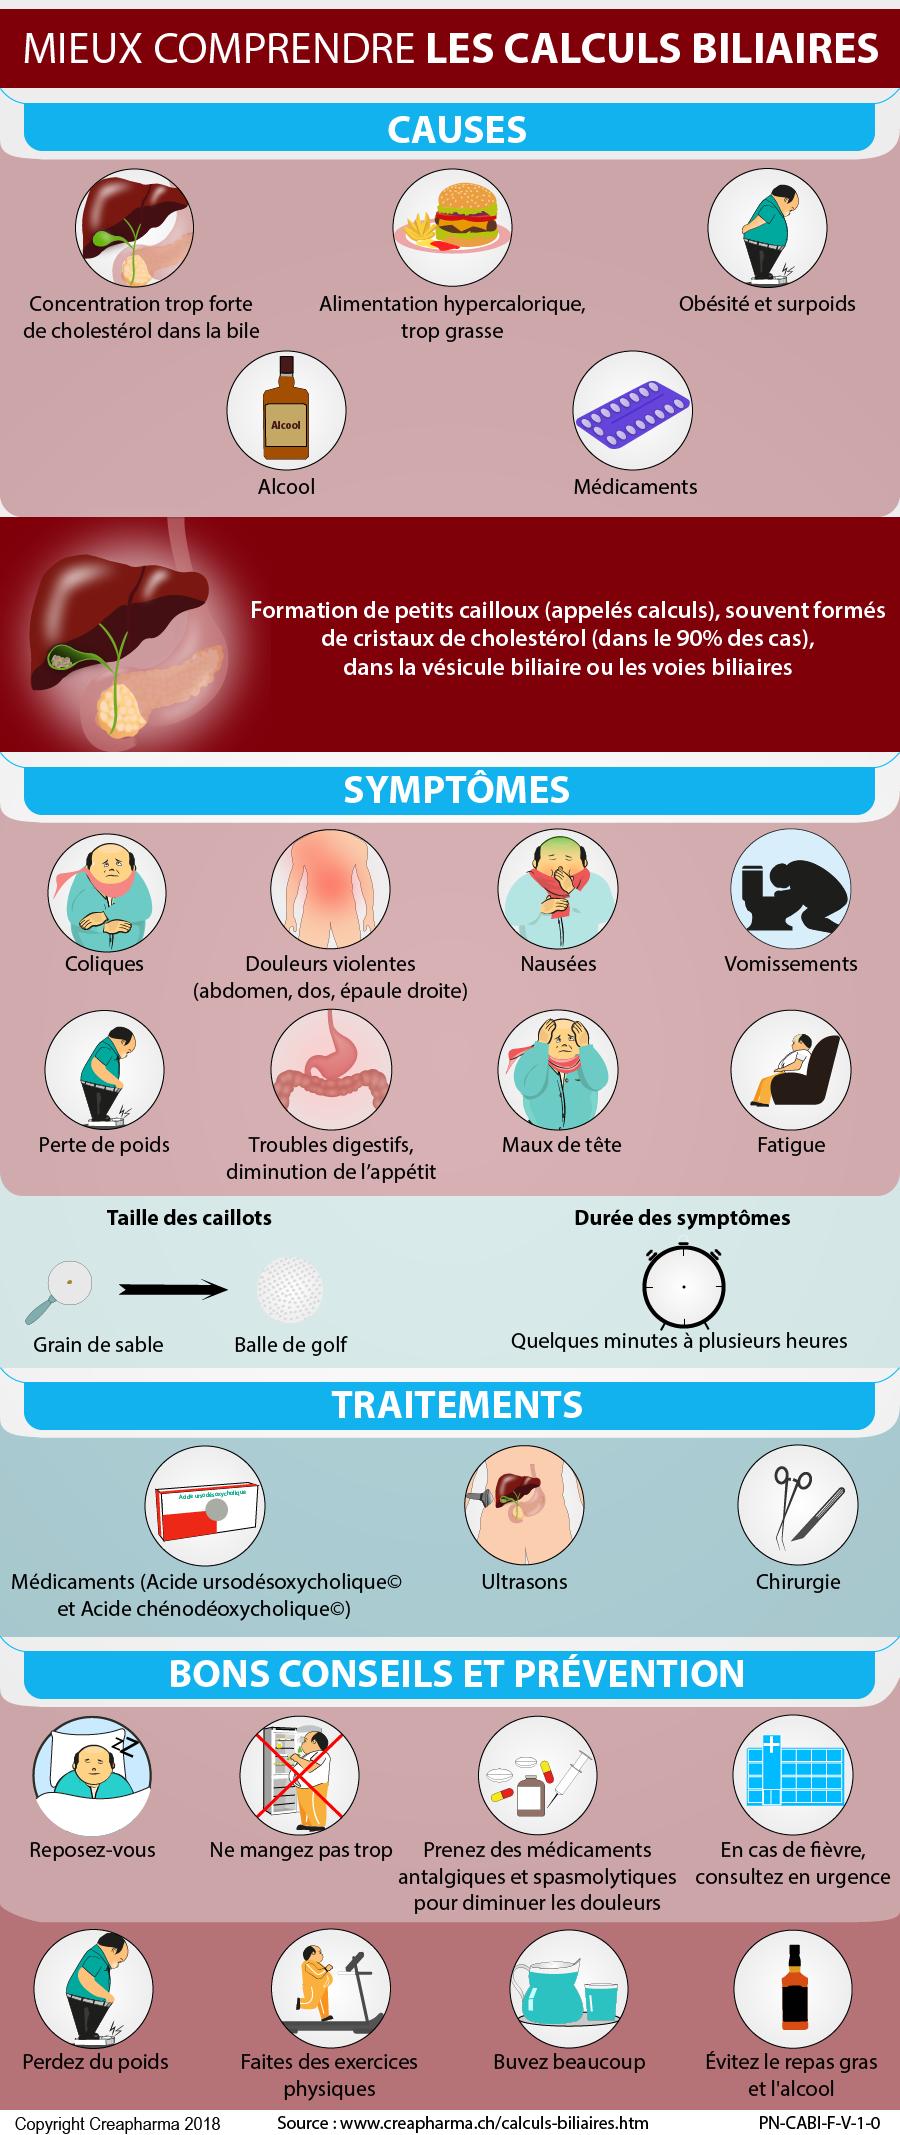 Calculs biliaires : causes, symptômes & traitements | Creapharma